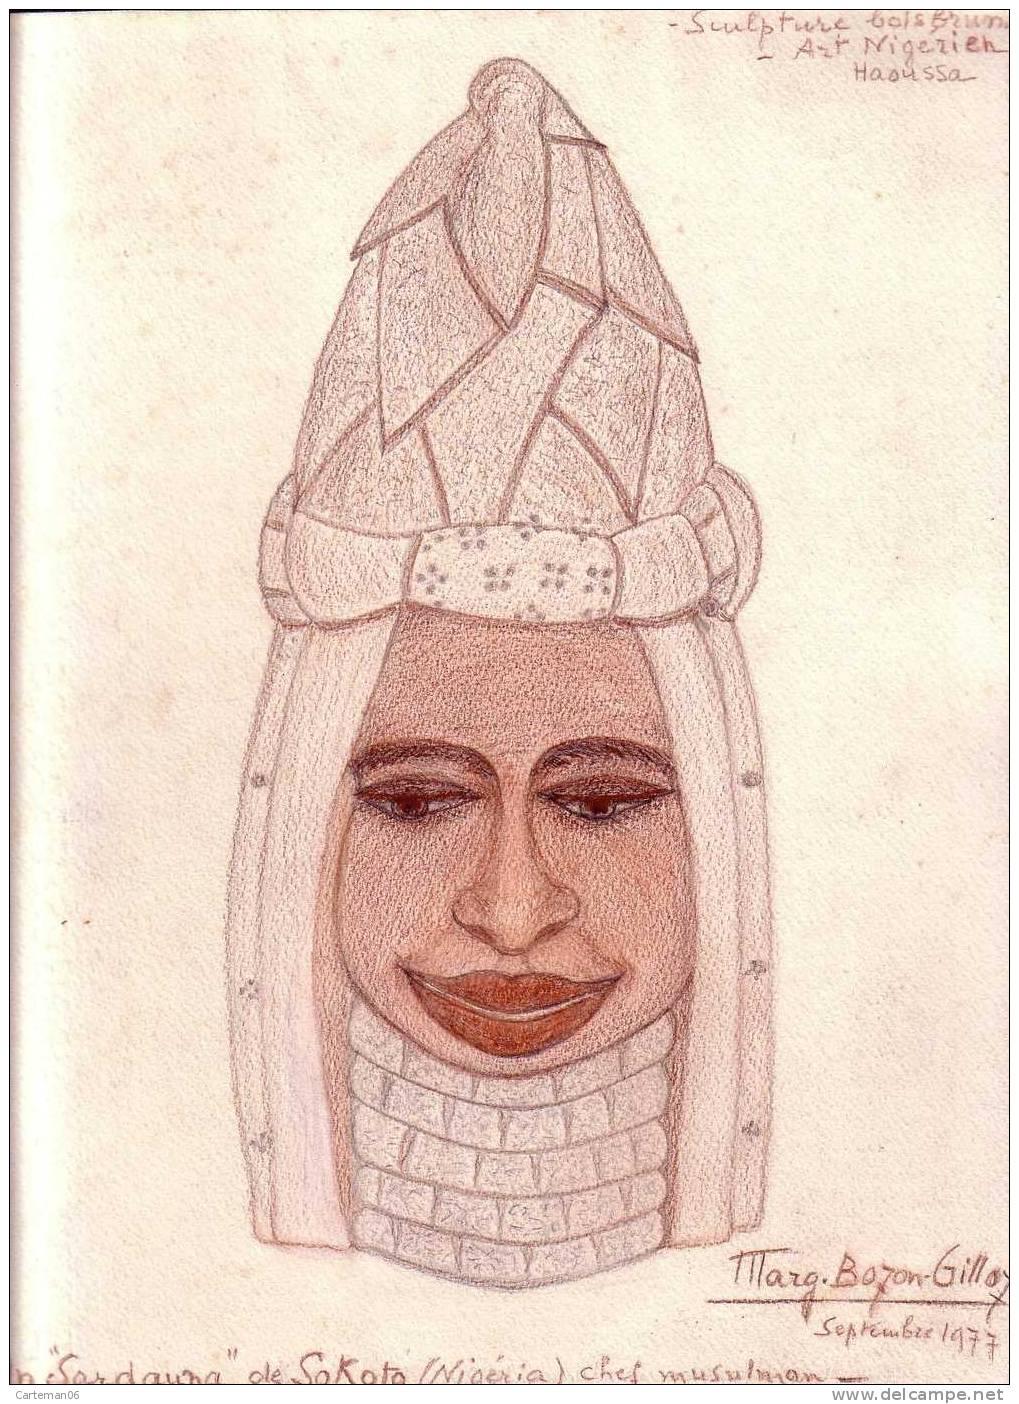 "Dessin Original De Marg. Bozon-Gilloz - Un ""Sardauma"" De Sokoto (Nigéria) Chef Musulman - Art Africain"